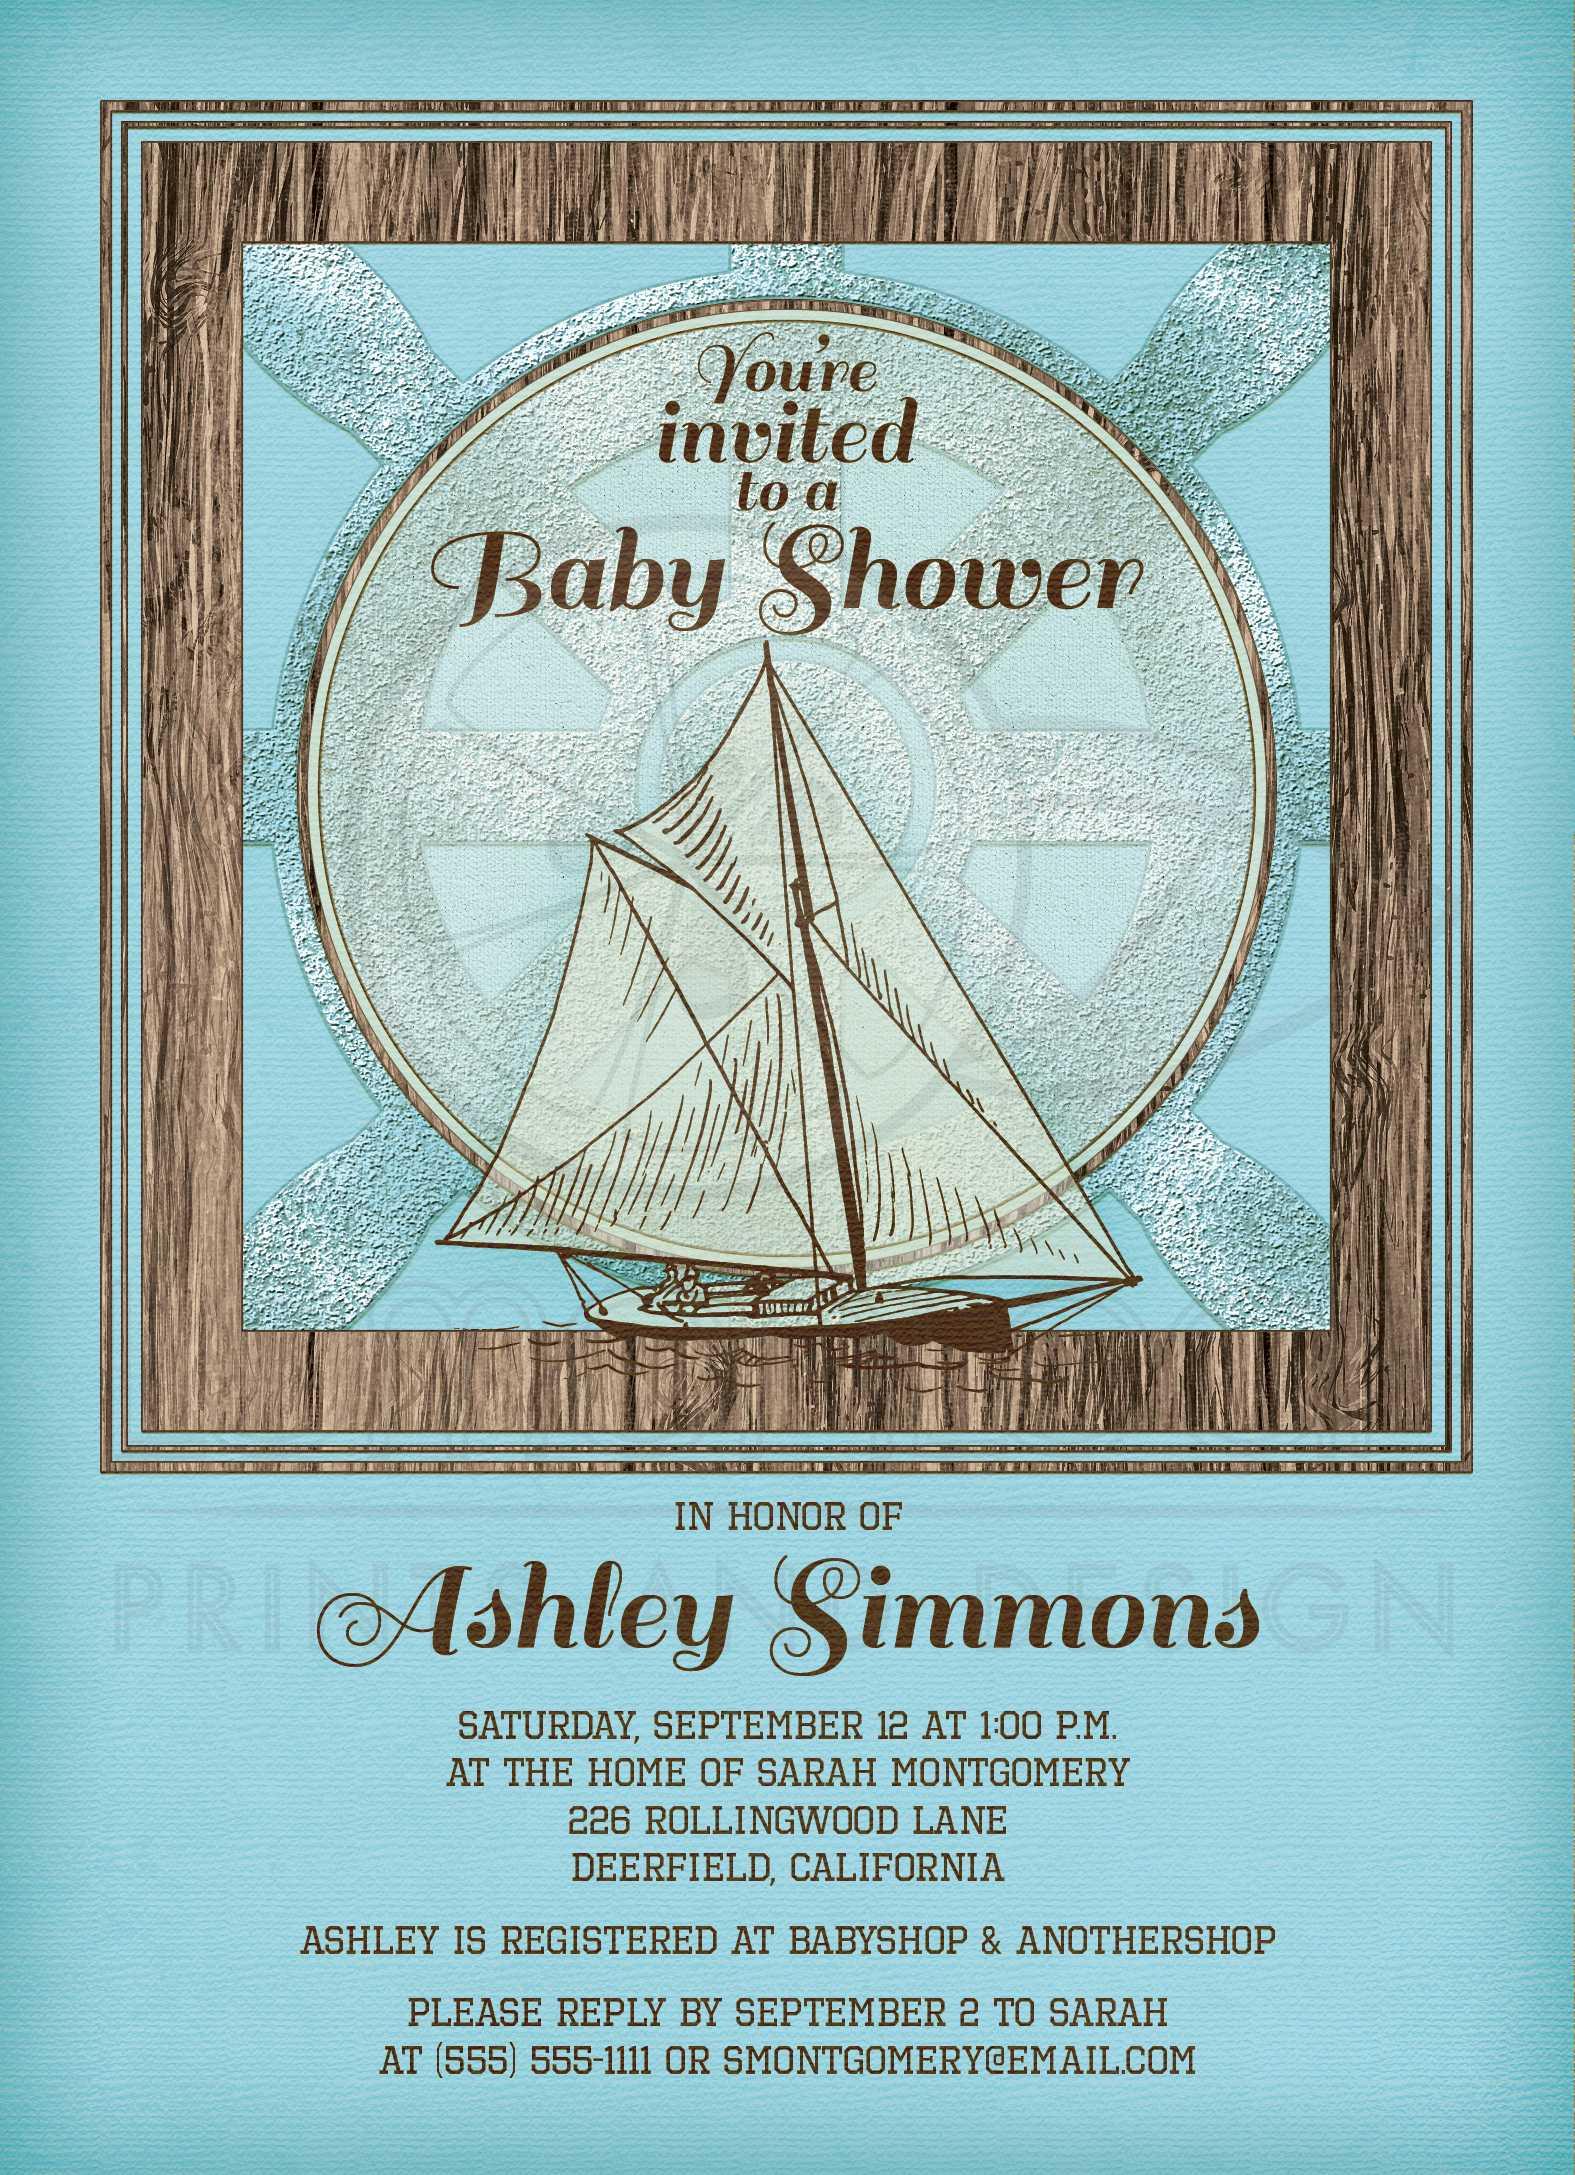 Nautical Themed Baby Shower Invitations – gangcraft.net